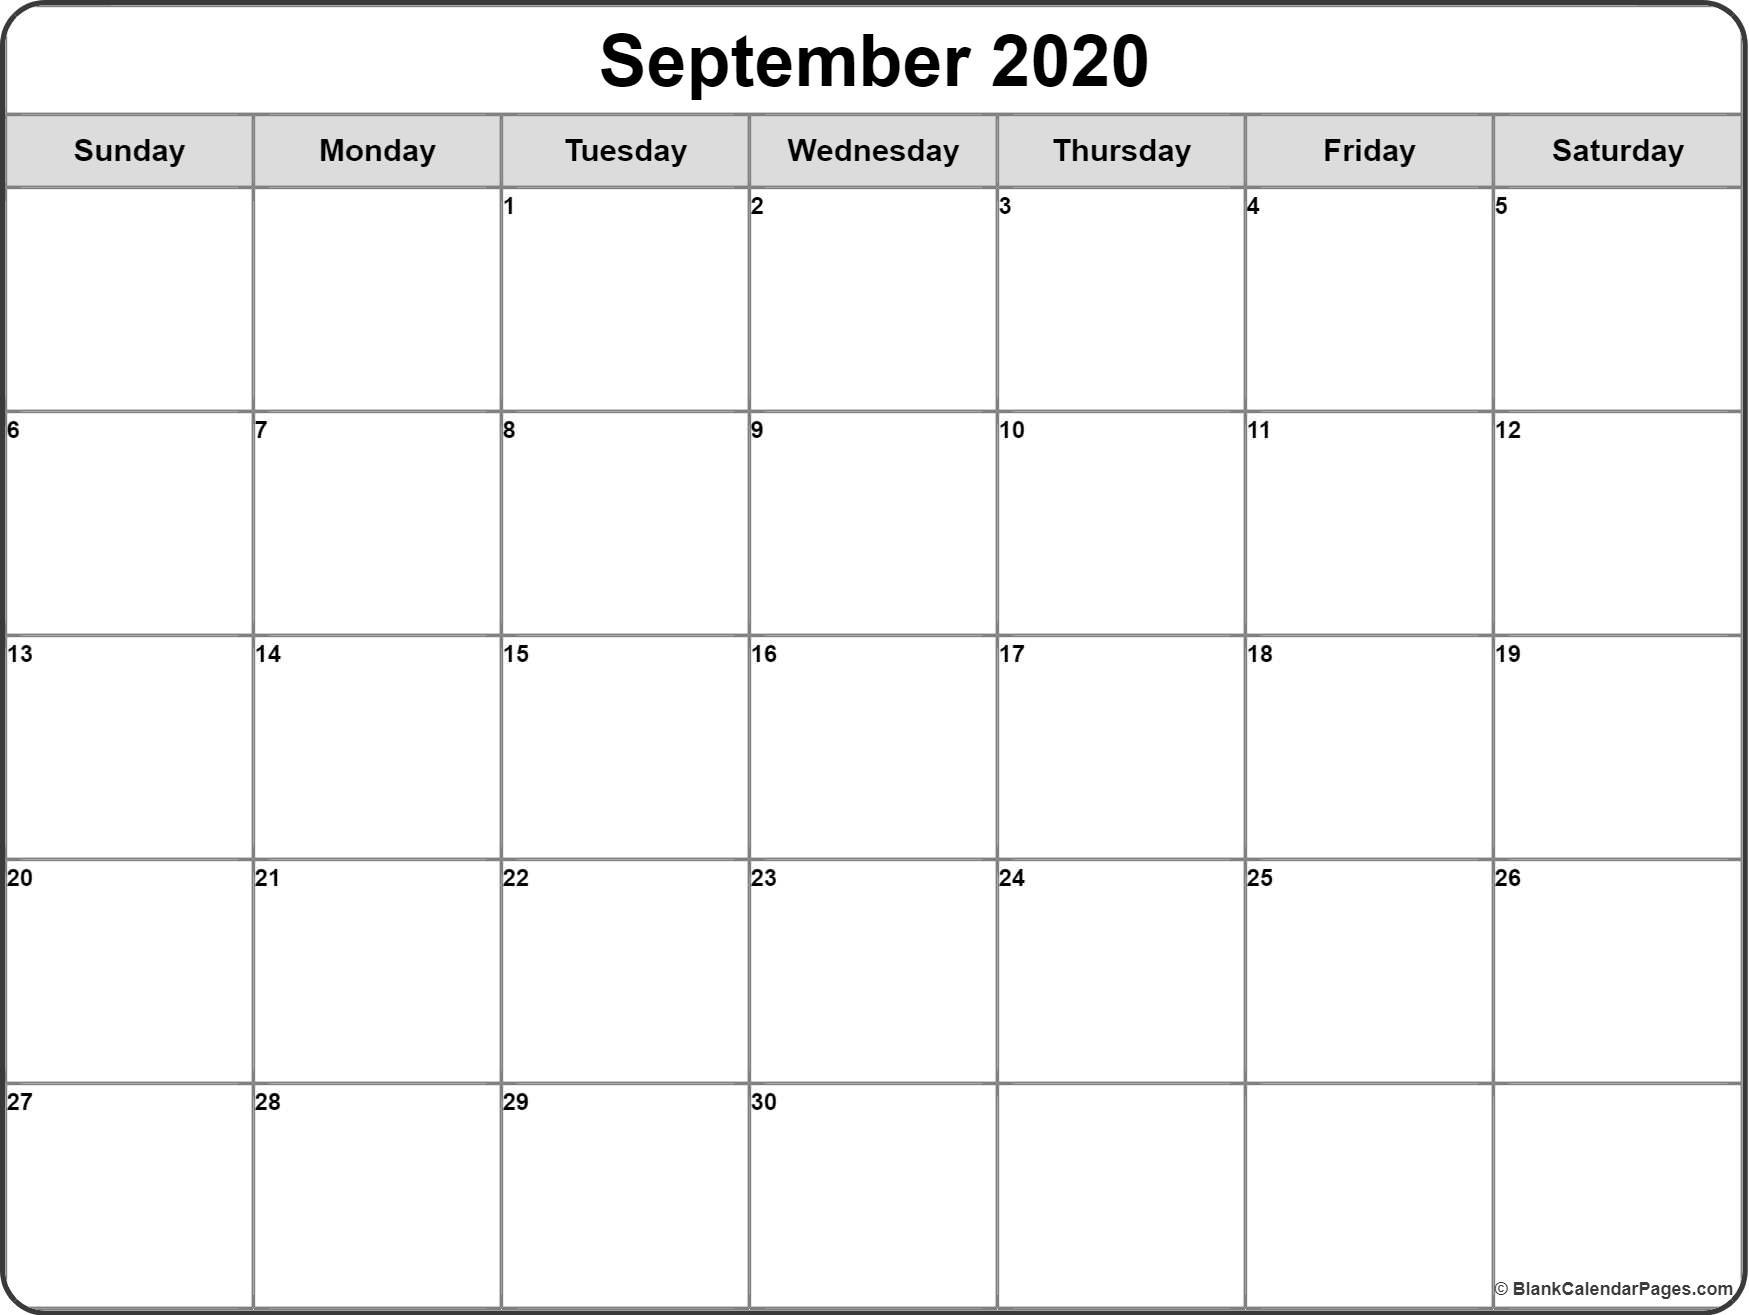 September 2020 Calendar | Free Printable Monthly Calendars inside Blank Monthly Calendar Template To Fill In